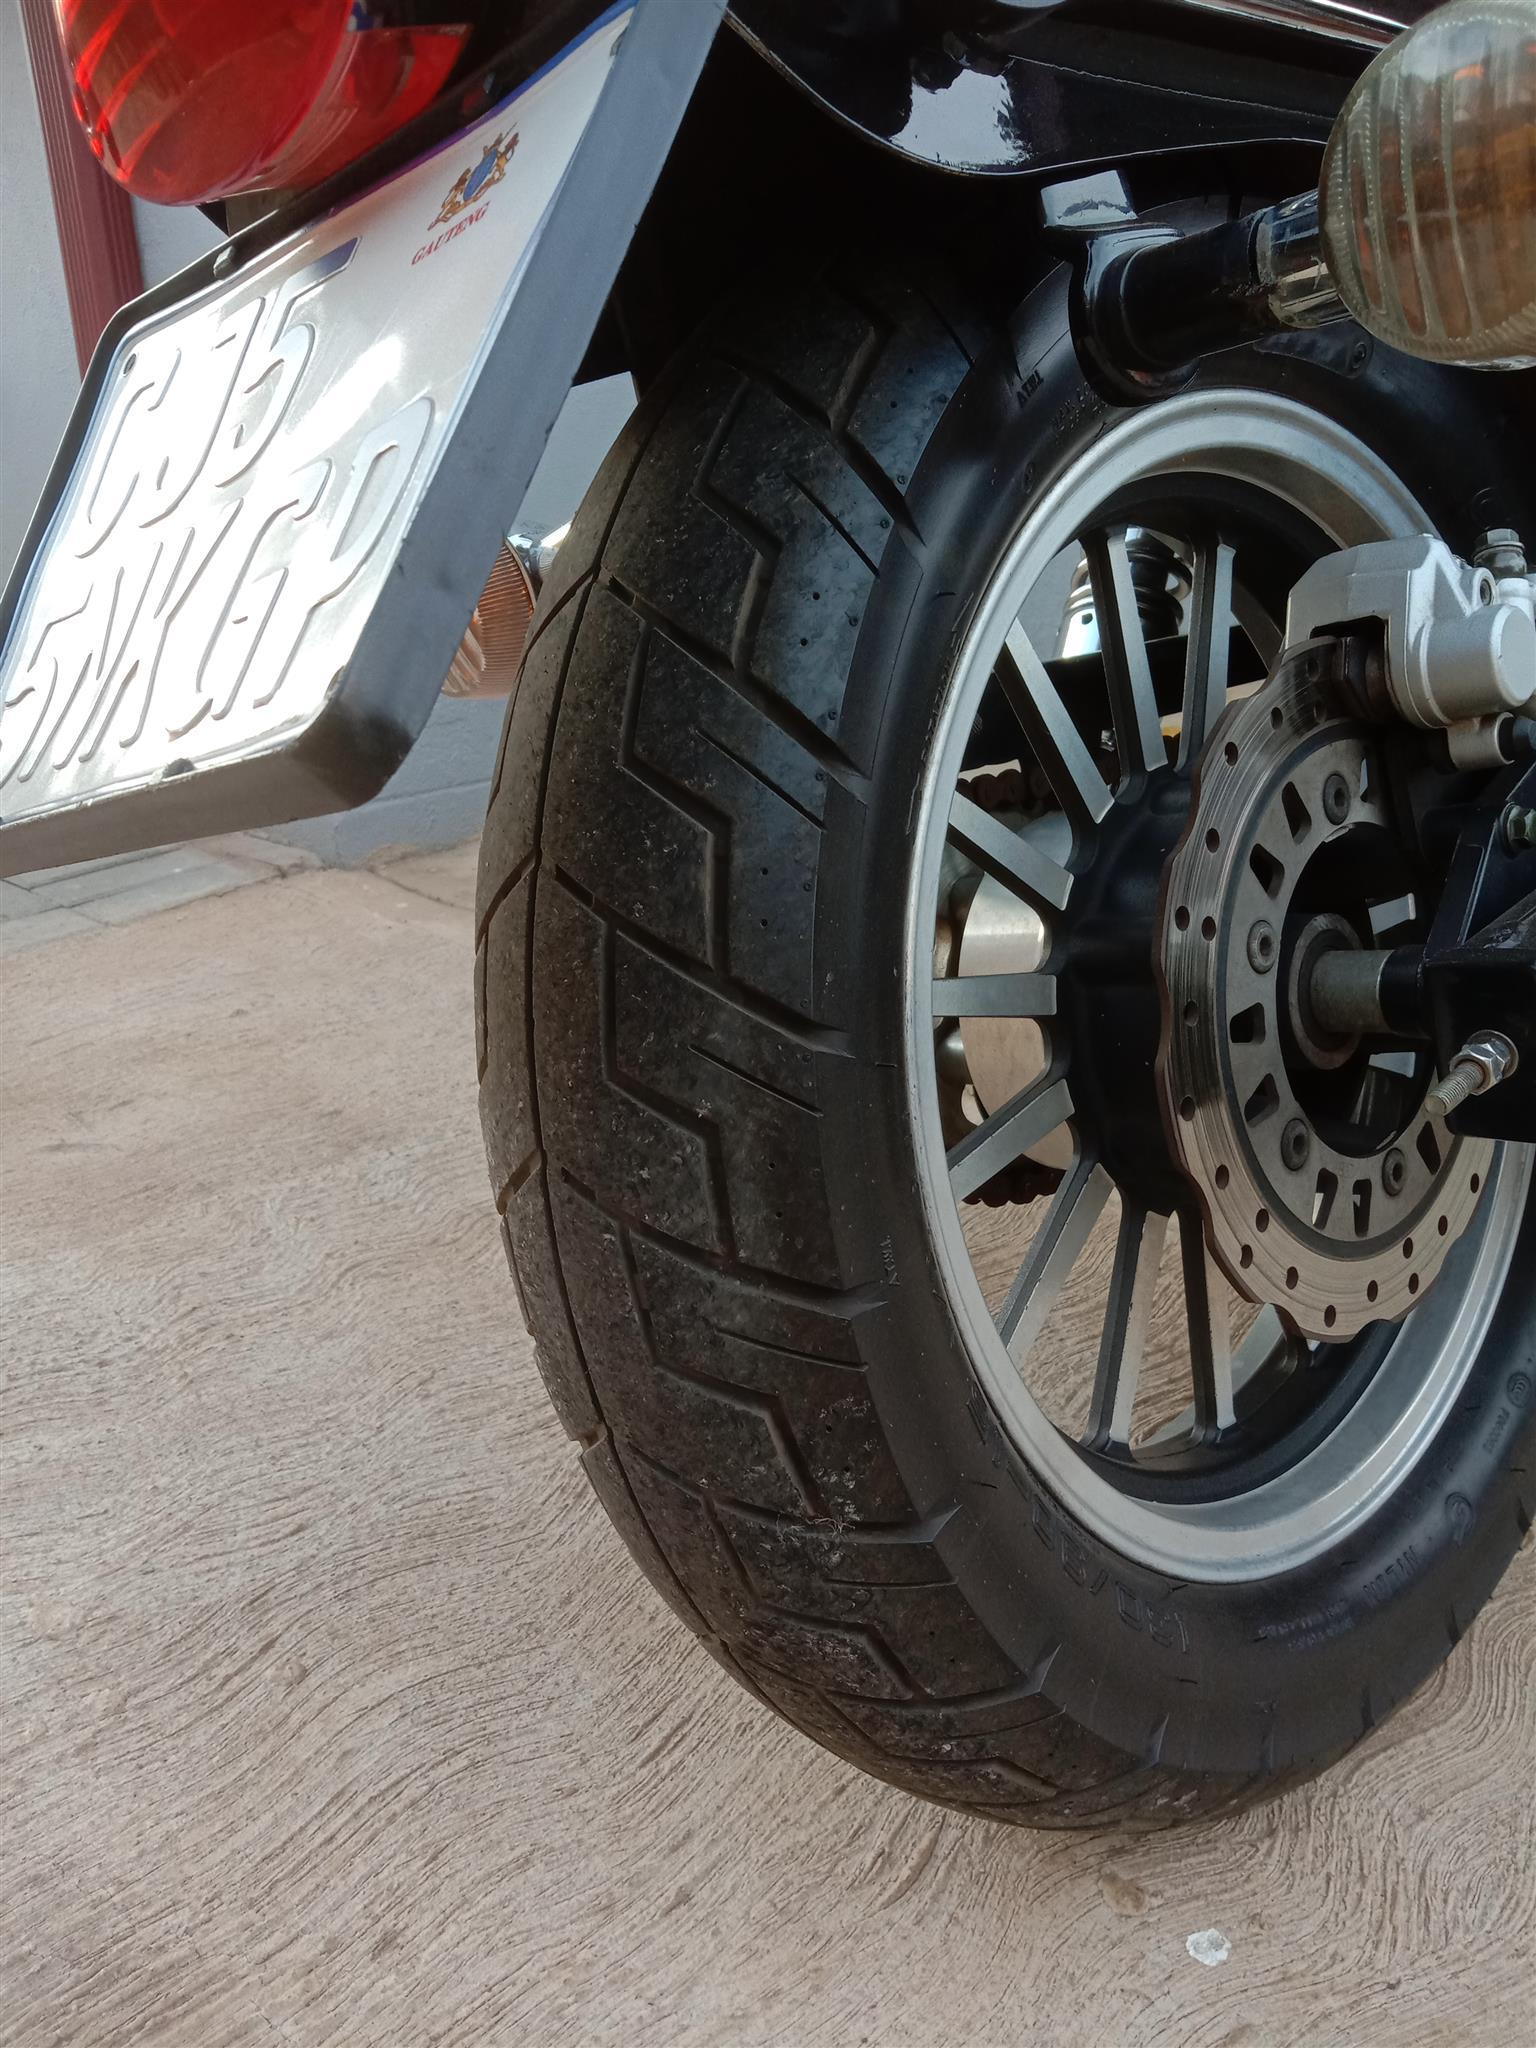 Regal Reptor 350cc